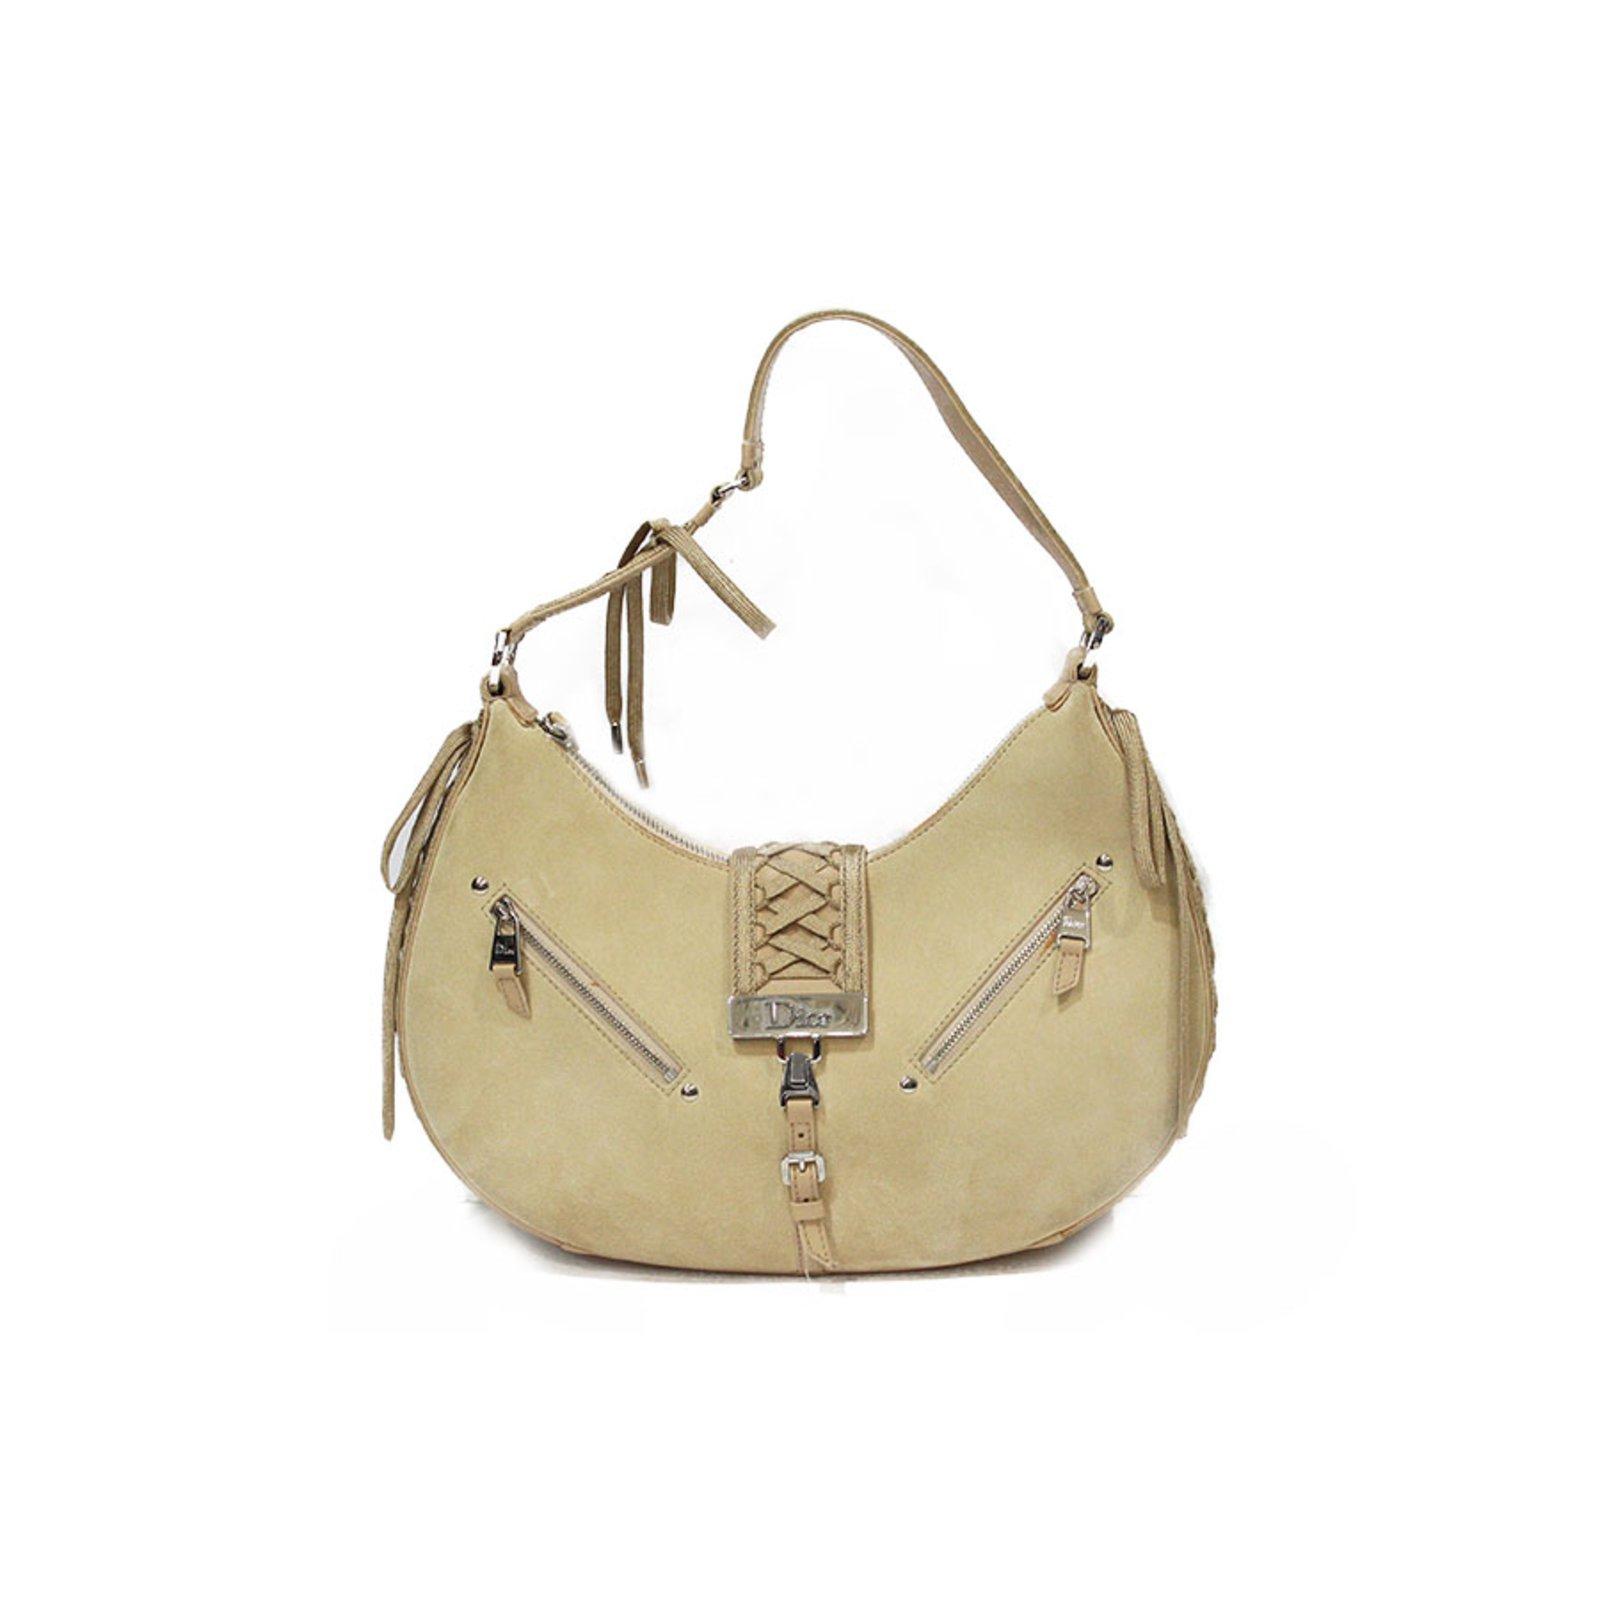 a7b666761821ff Christian Dior Sac dior and daim ecru Handbags Leather,Deerskin Beige,Cream  ref.